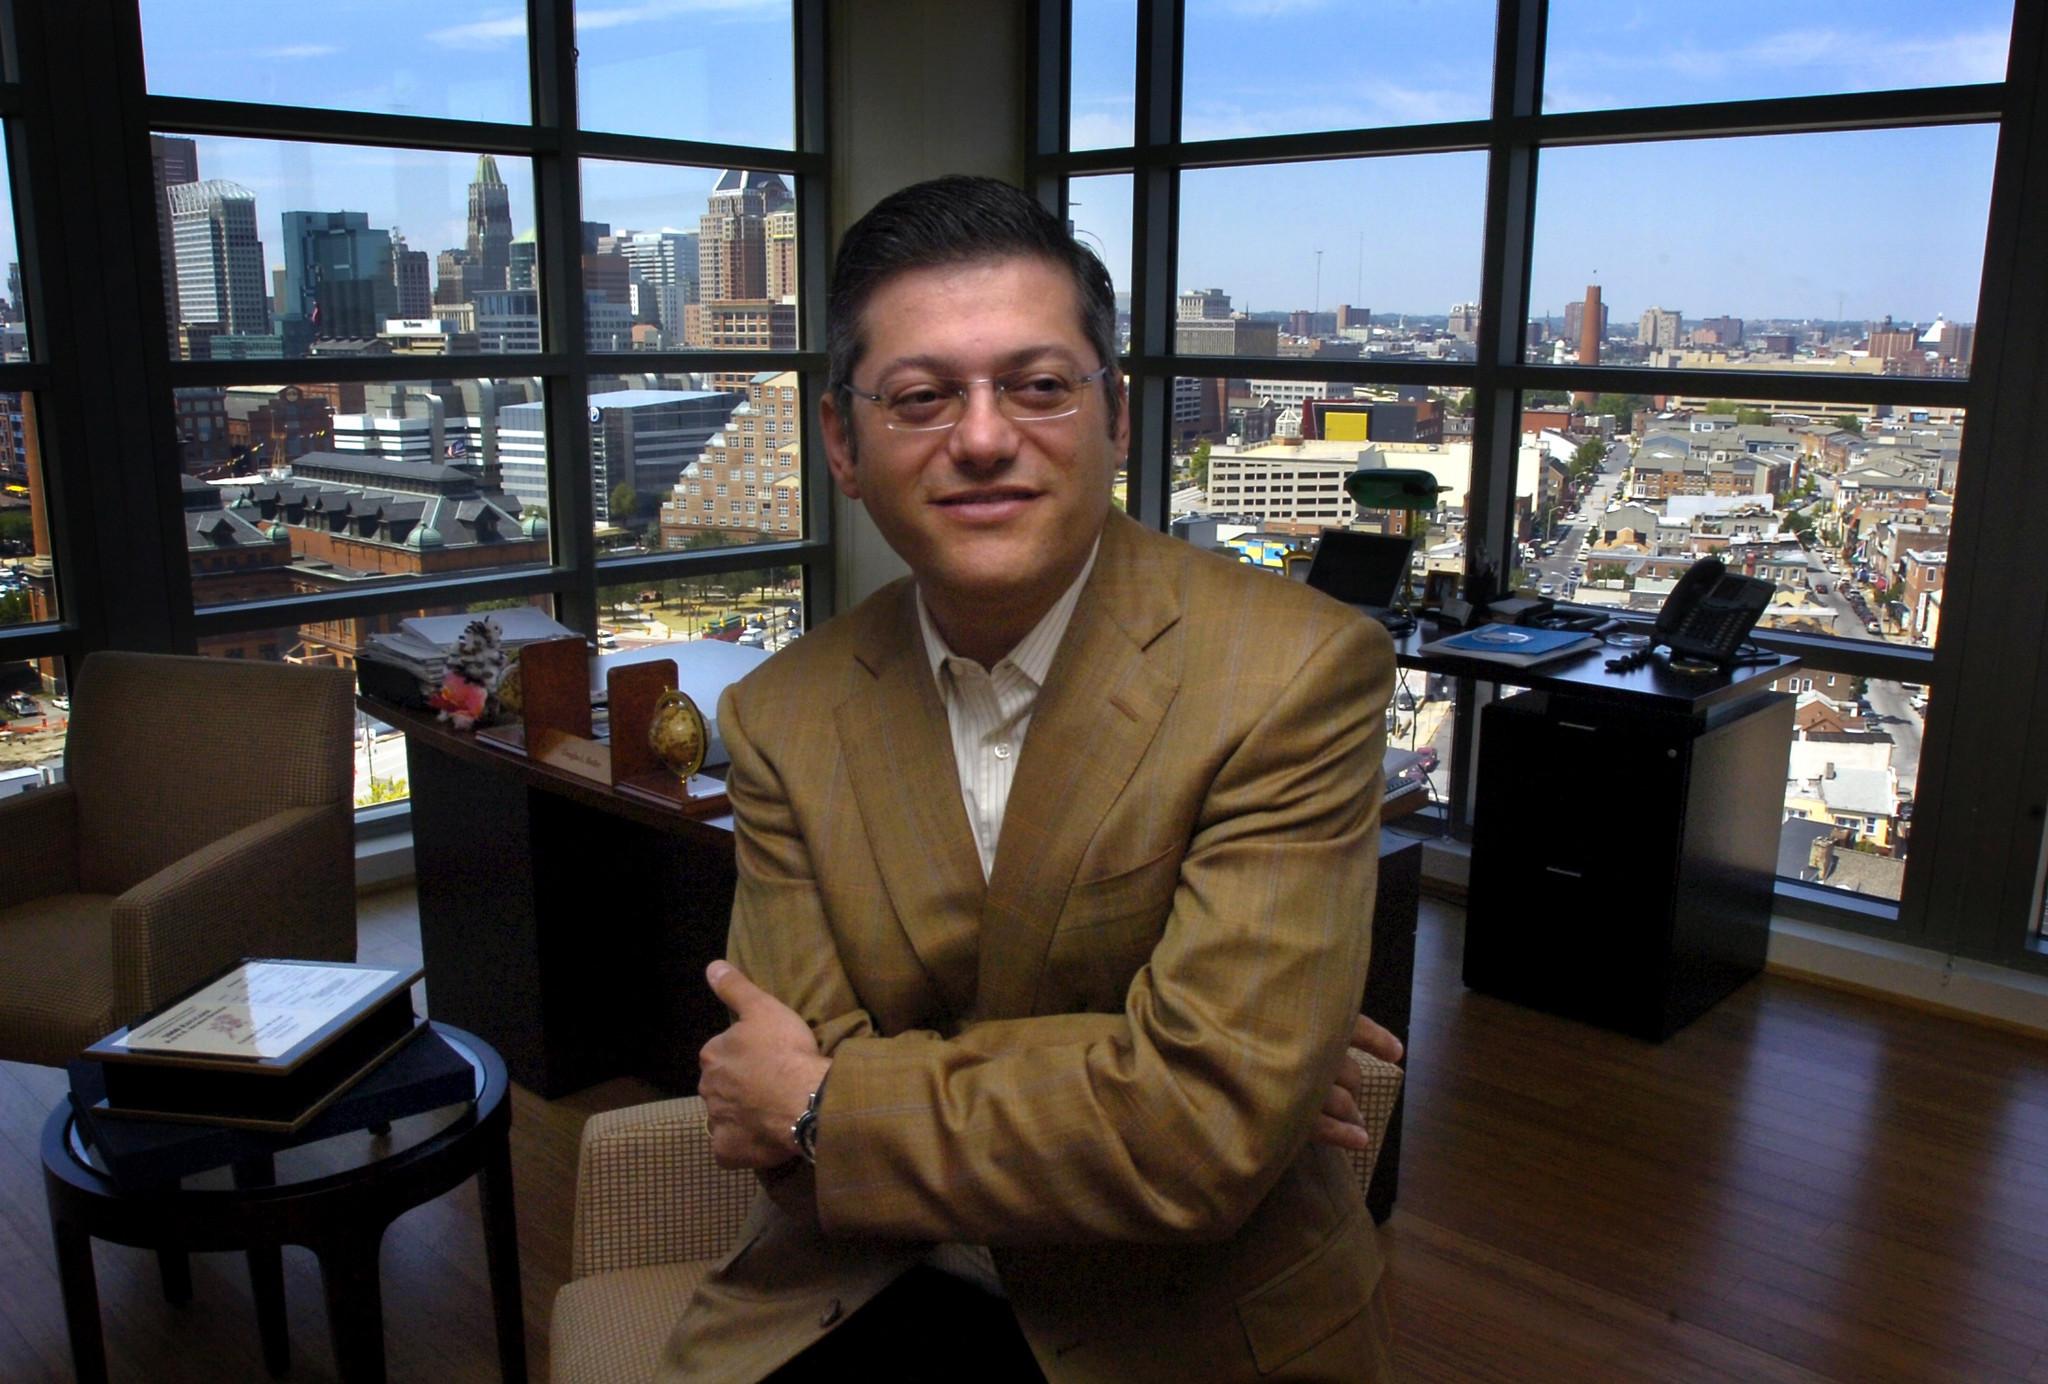 Laureate education sells two international universities for Becker study plan